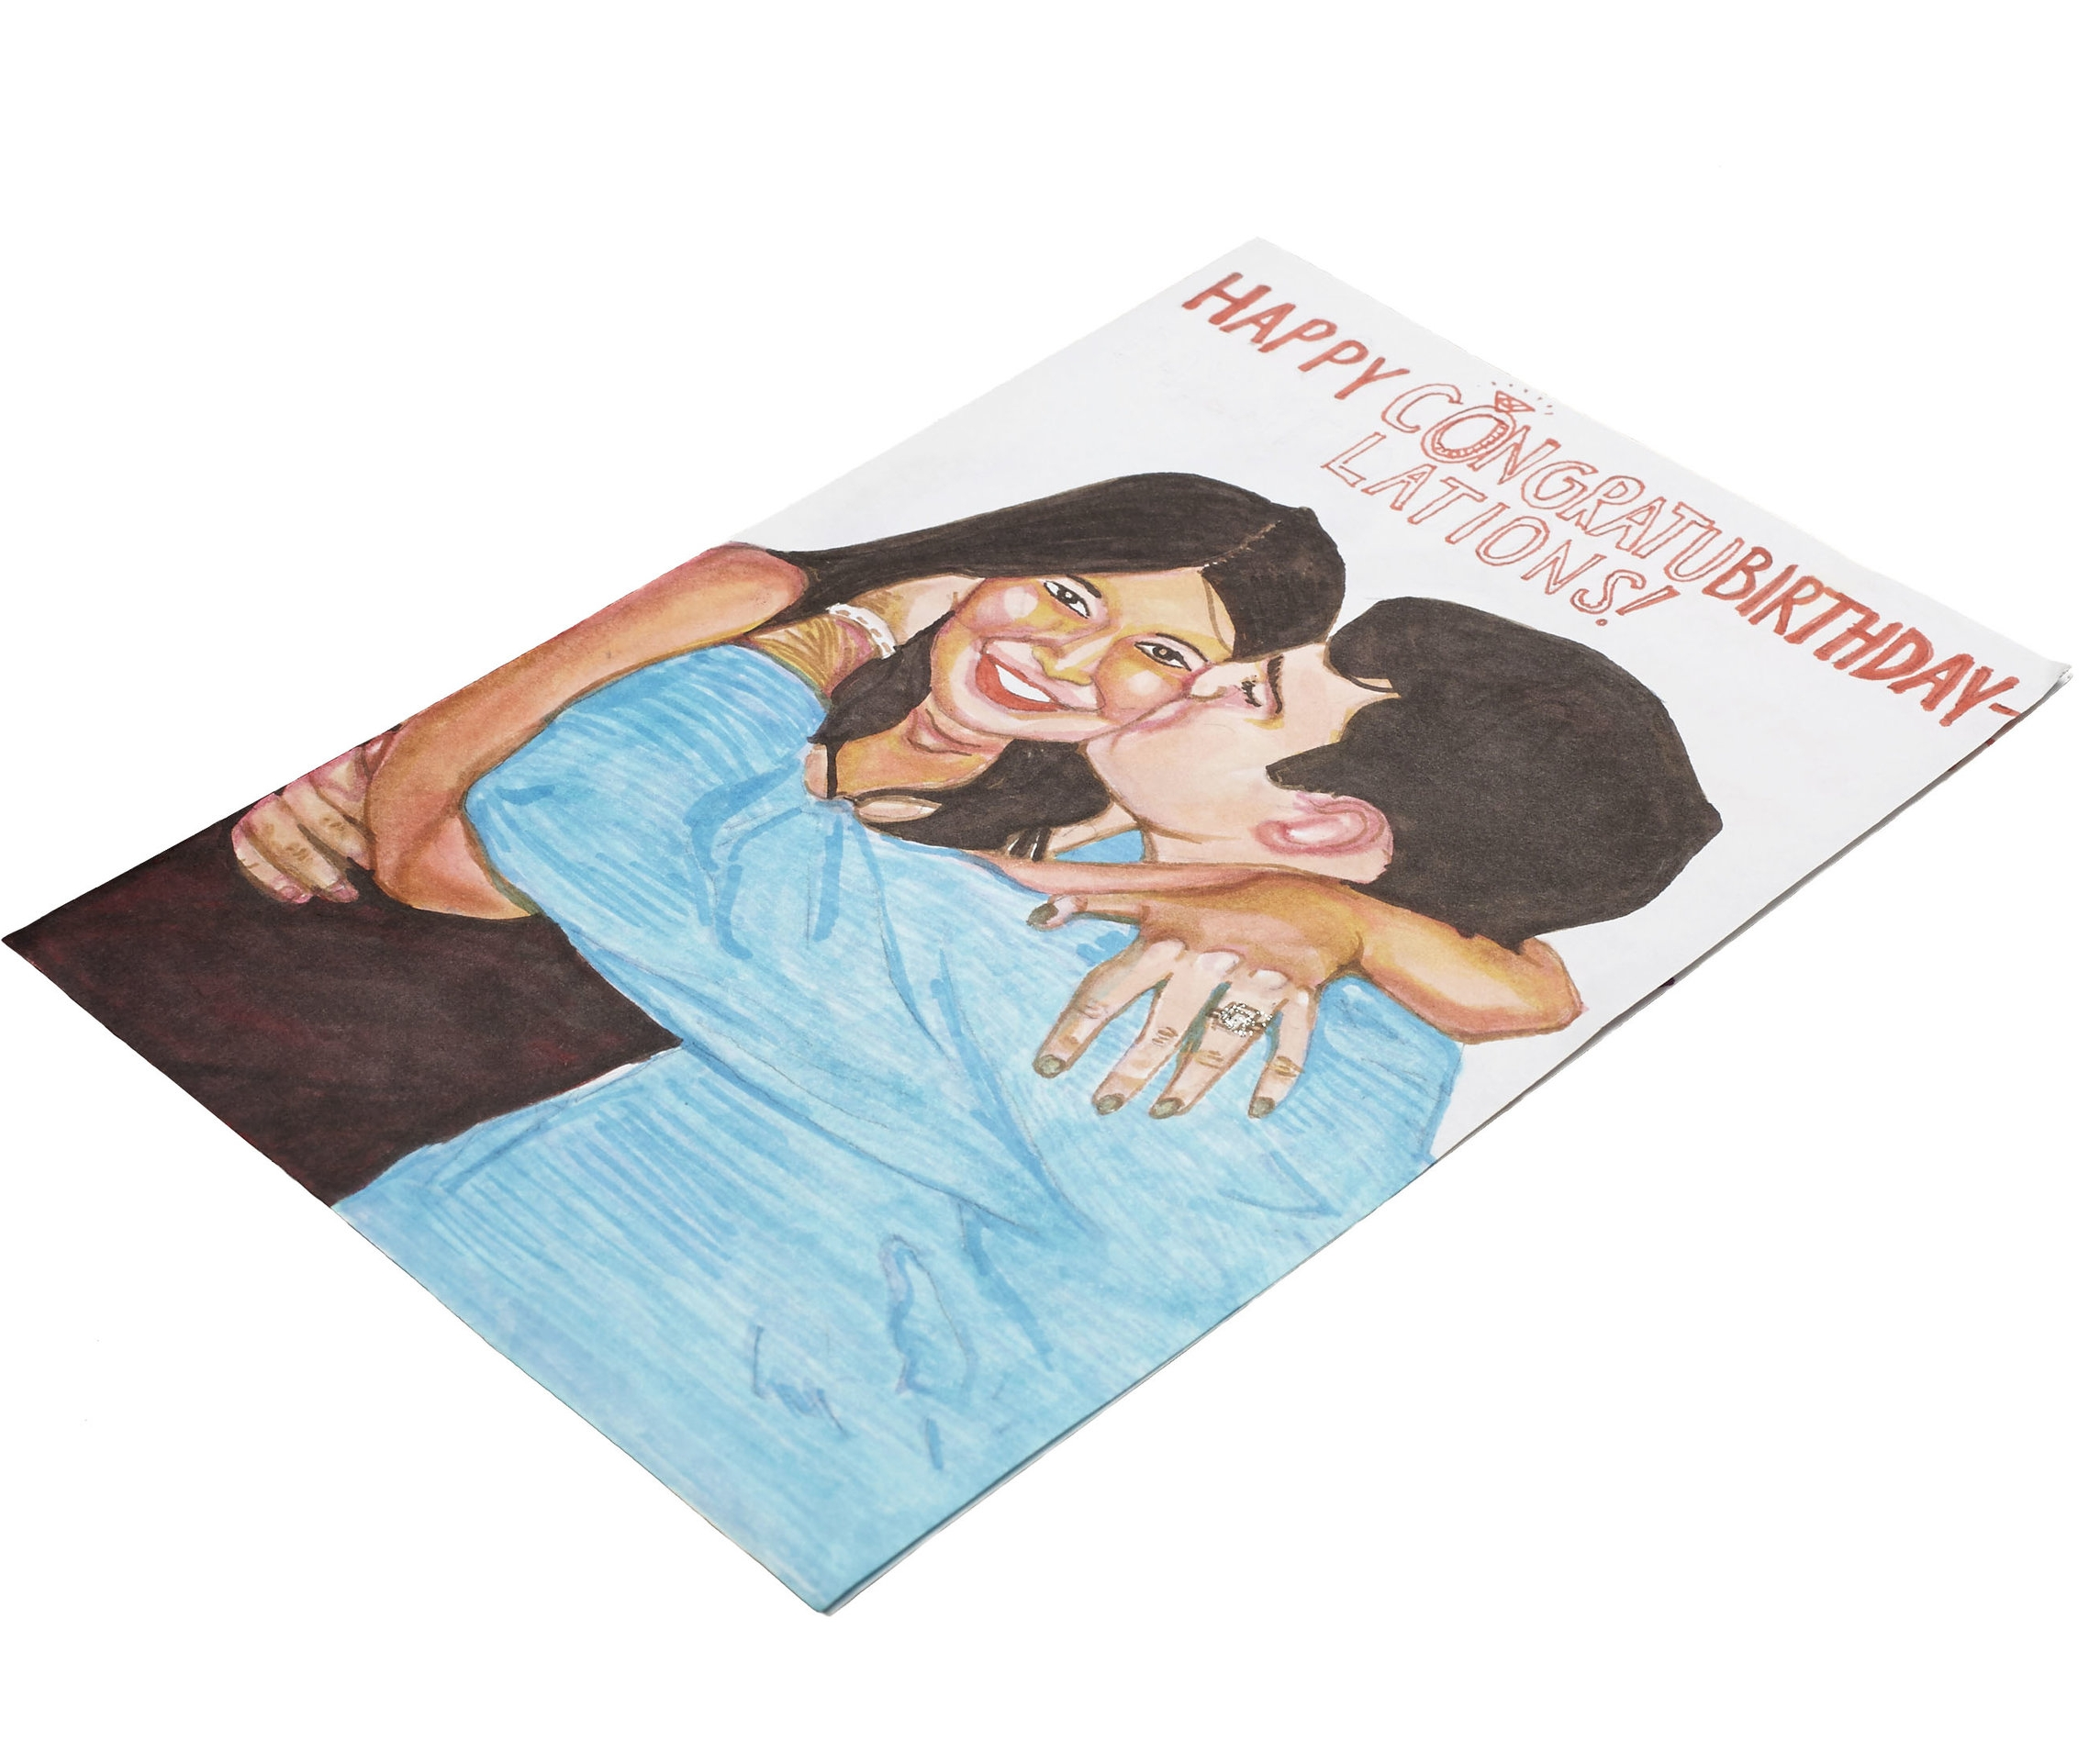 hand drawn anniversary card illustration.jpg